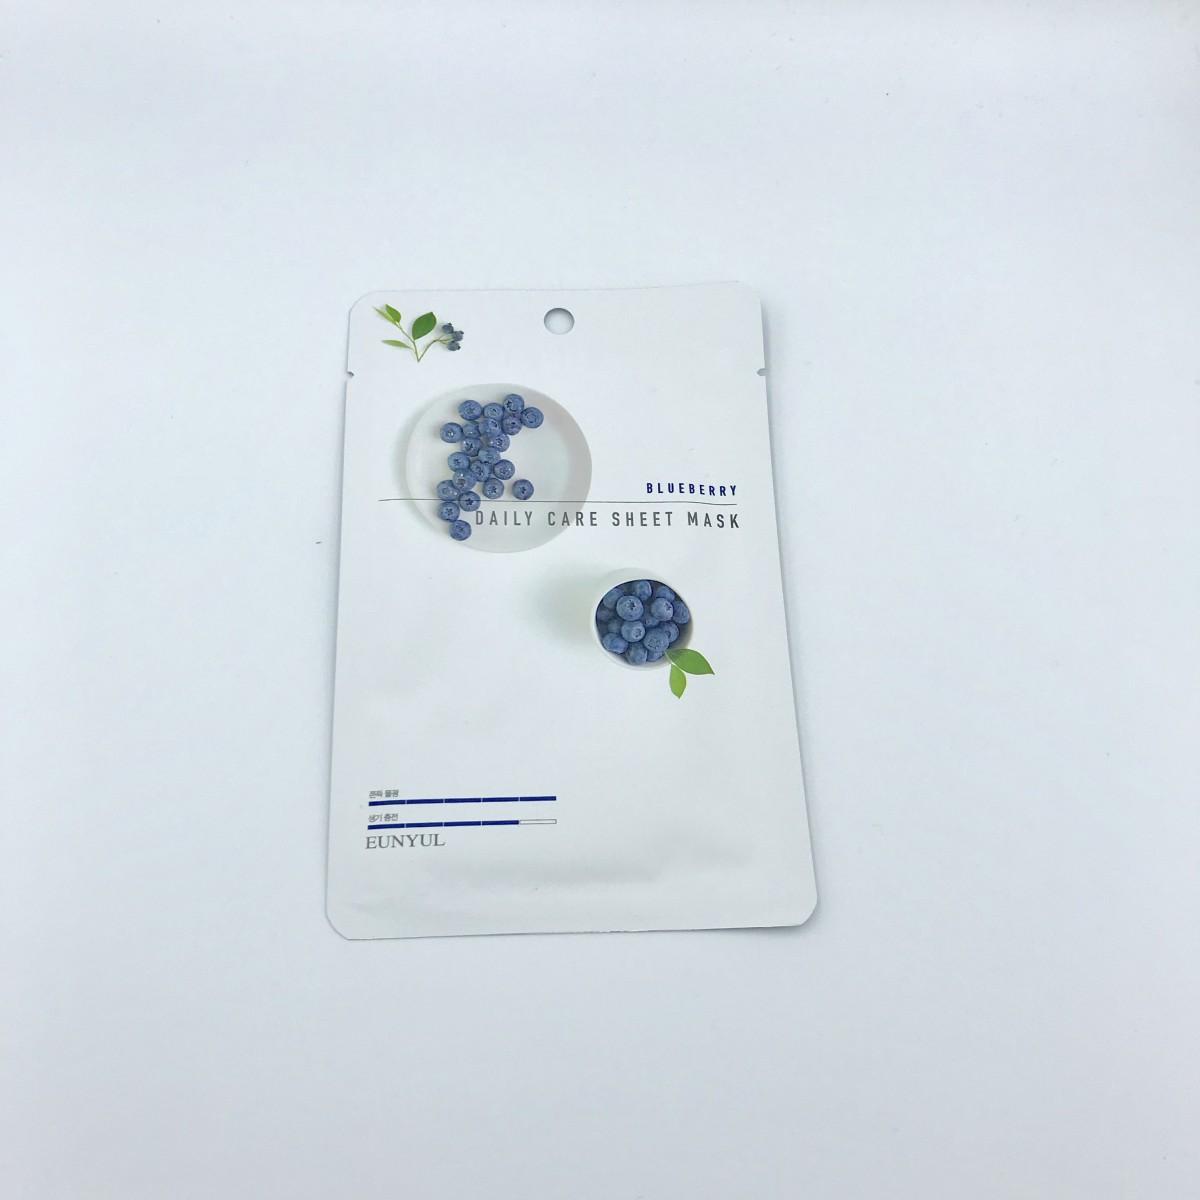 Тканевая маска с черникой Eunyul Daily Care Mask Sheet Blueberry - 22 г